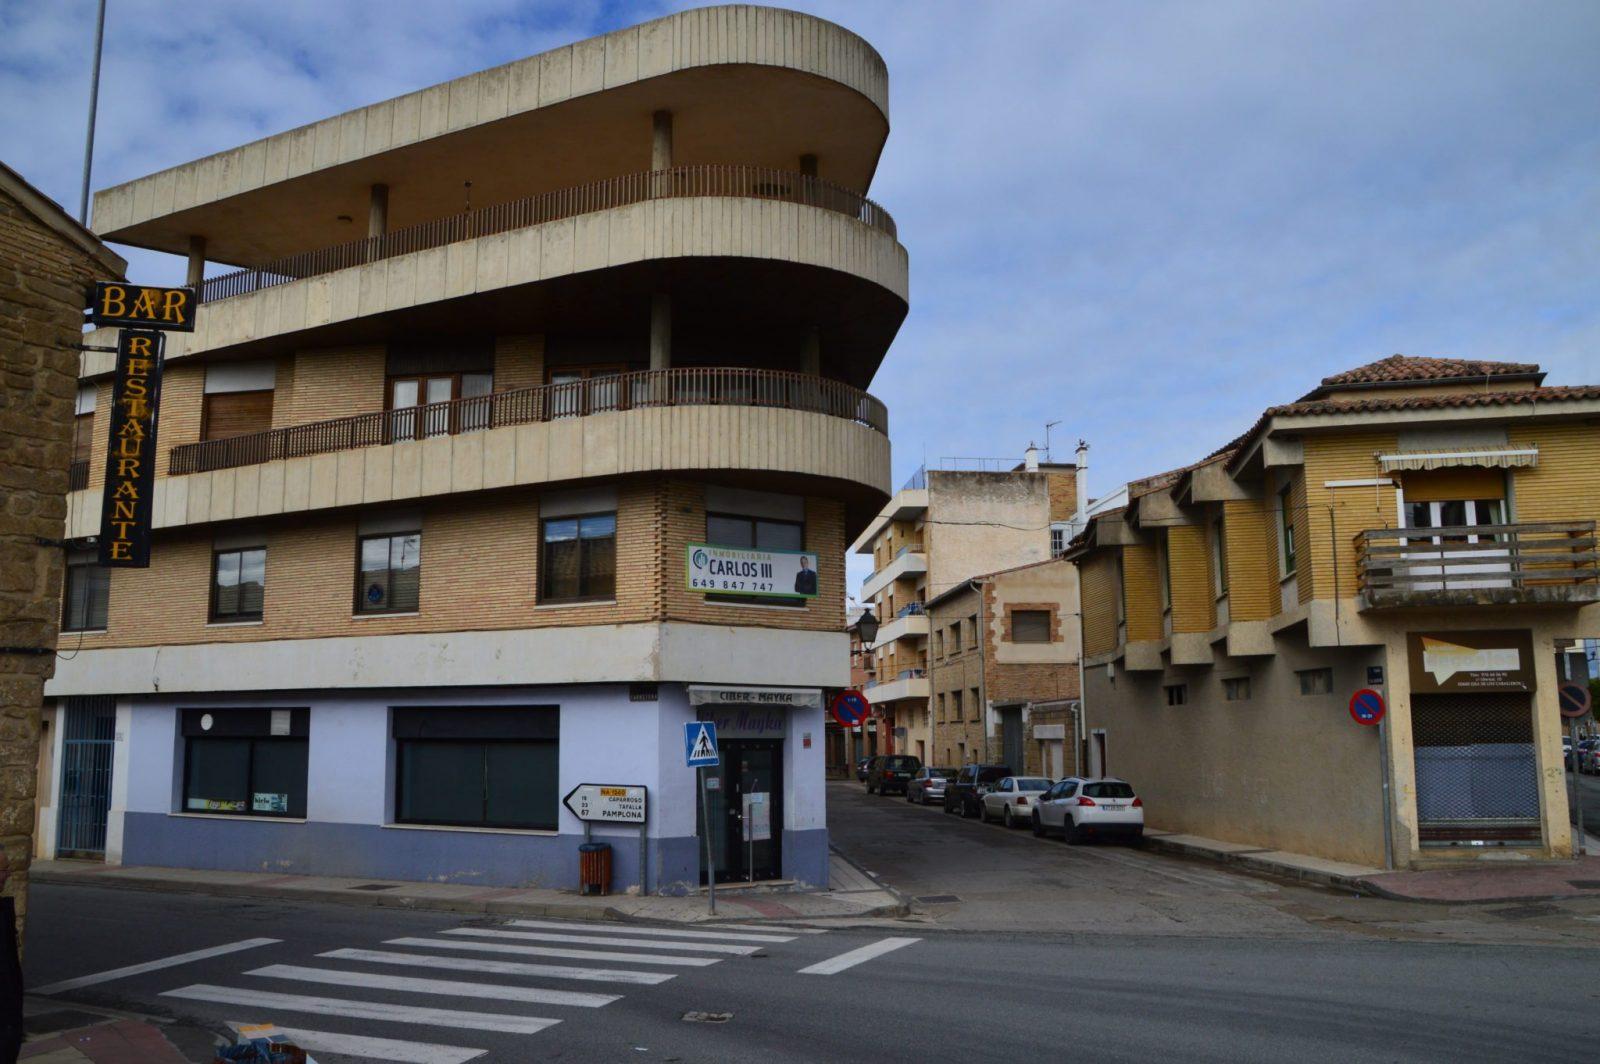 Piso Calle Carretera 53